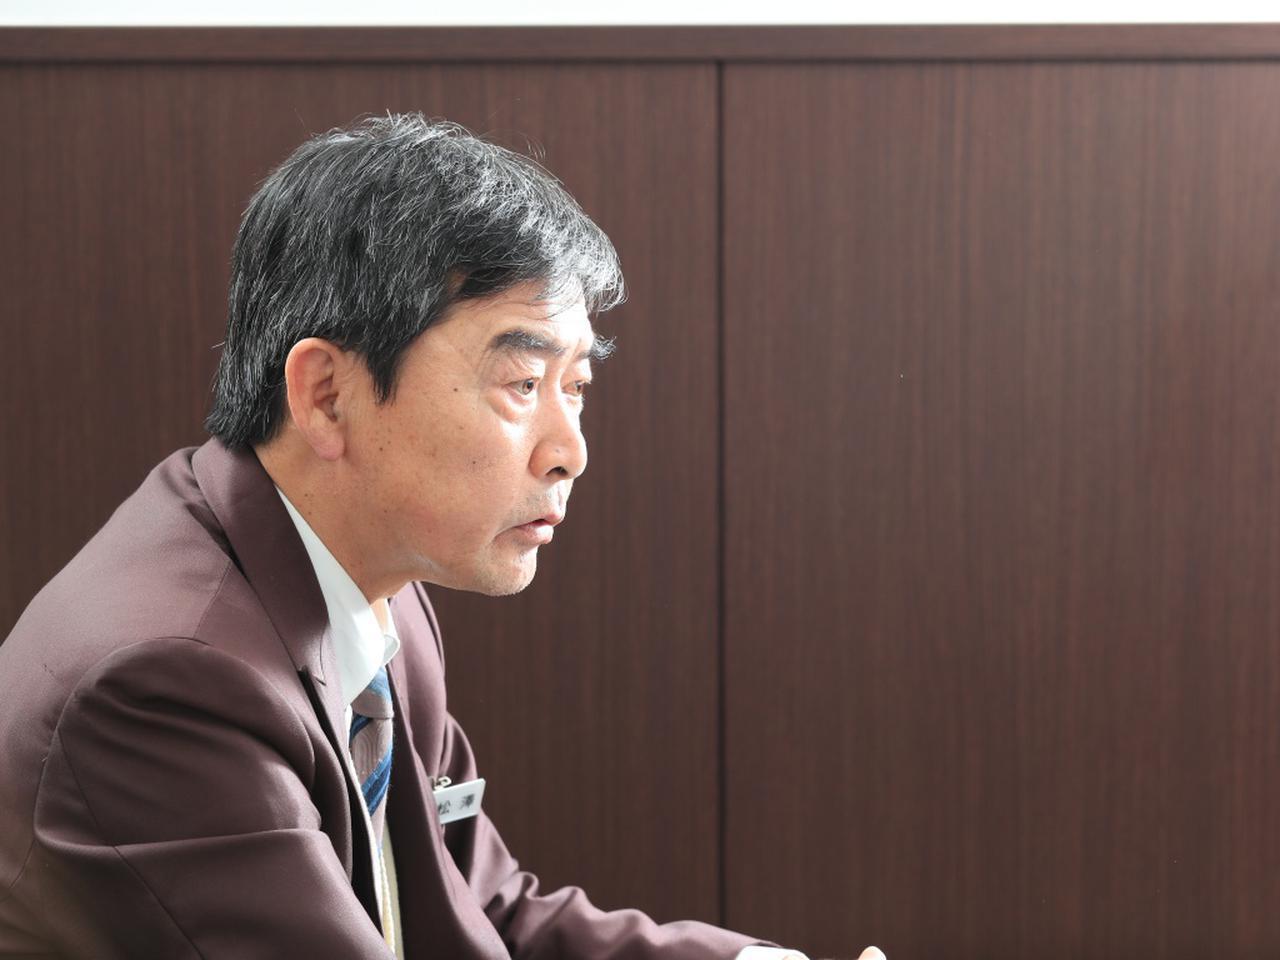 画像: 赤羽ゴルフ倶楽部 松澤淳二支配人